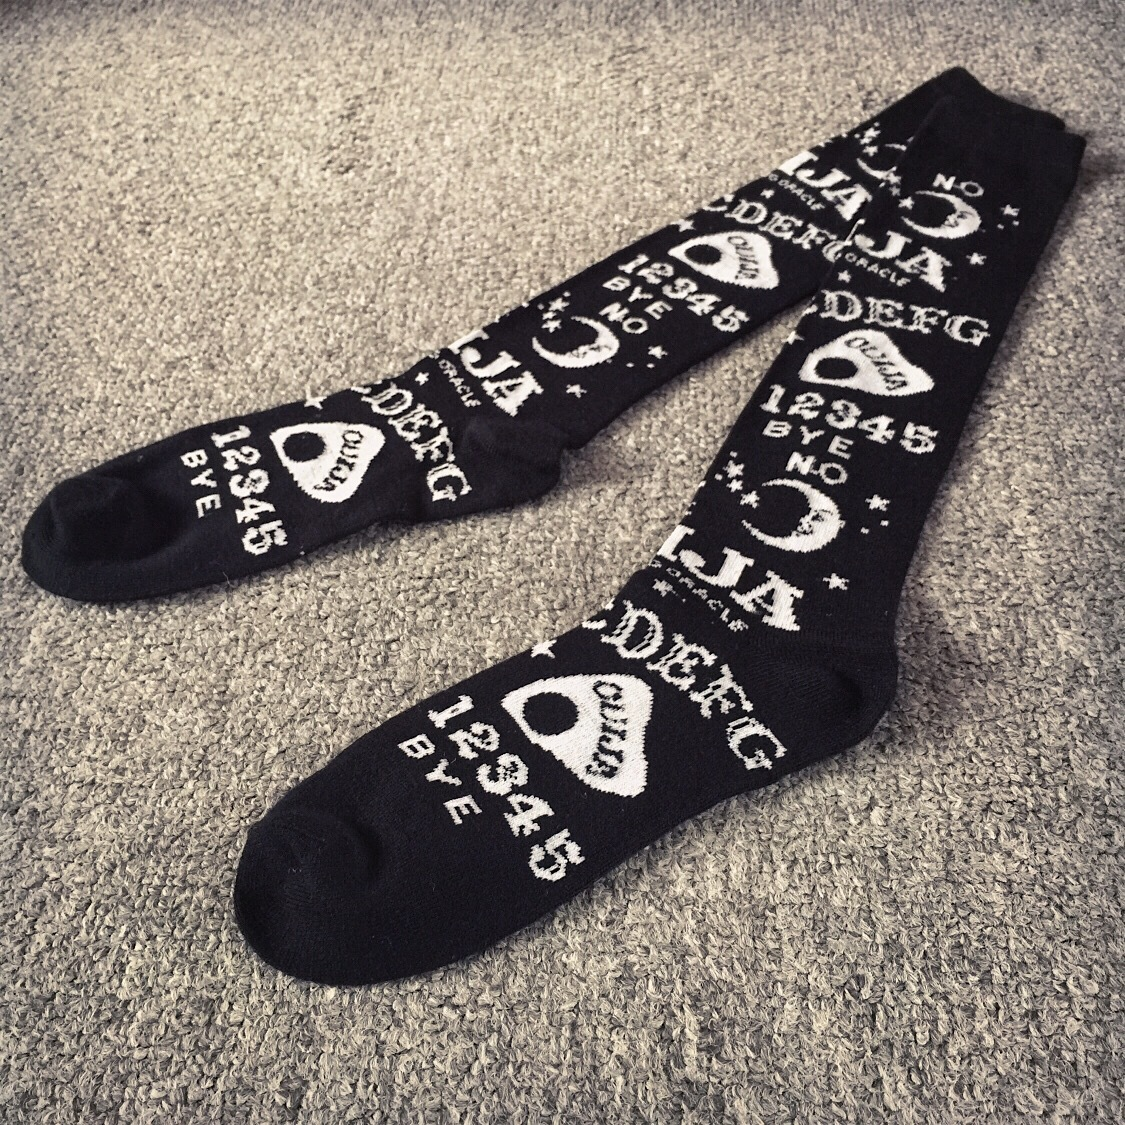 Funny English letters socks Knee-High moon and star black sock men women dress European style Comfortable cute happy sokken hot